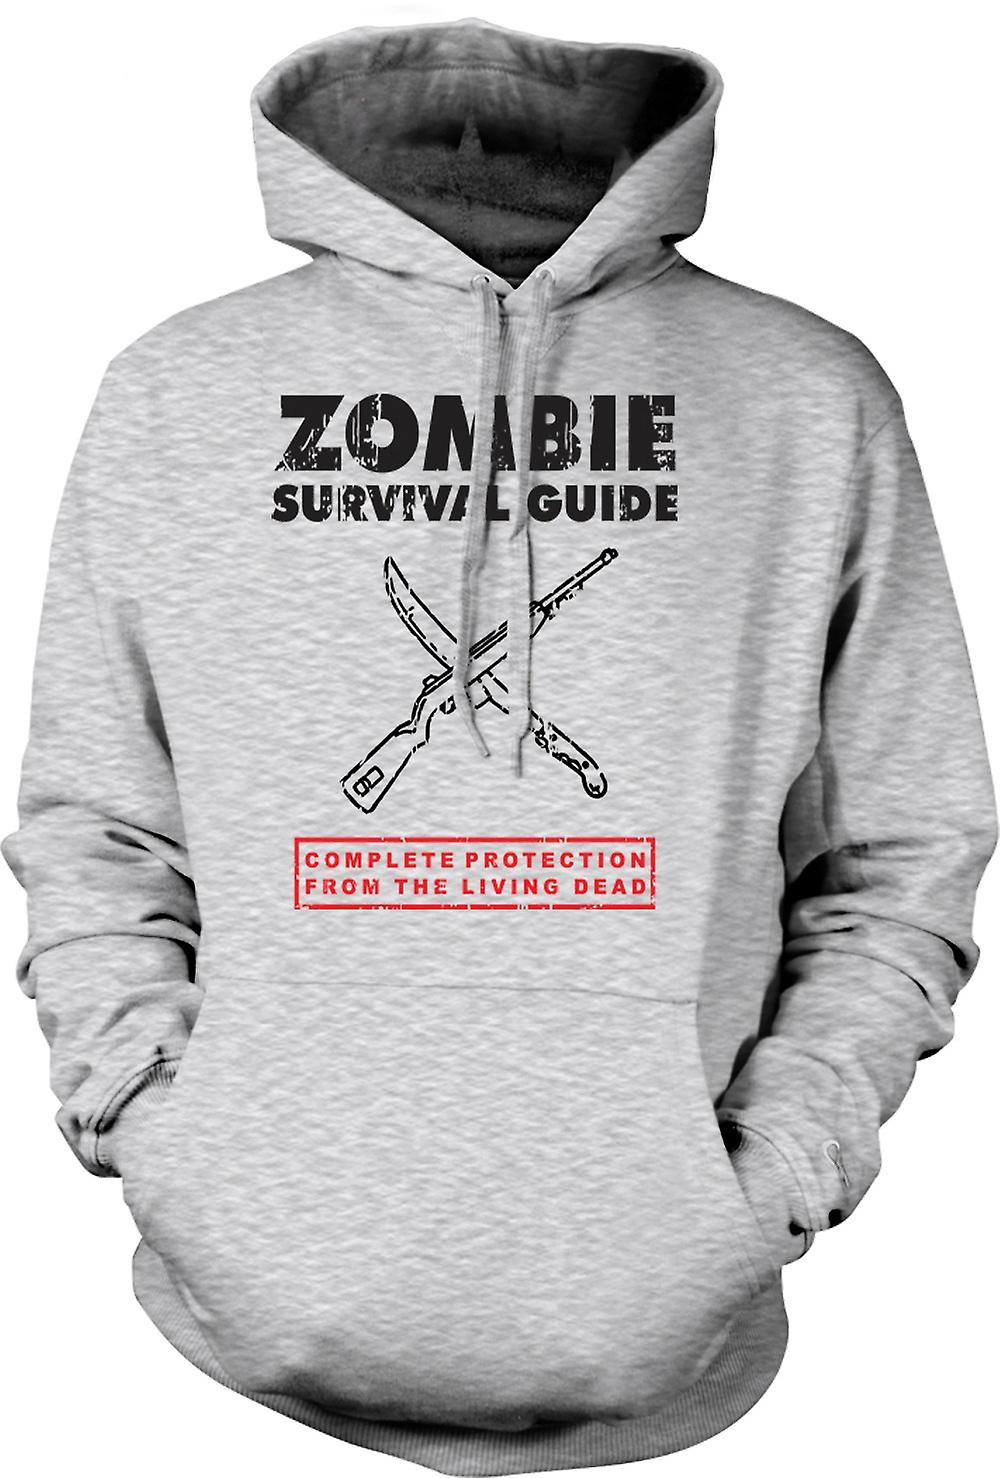 Mens Hoodie - Zombie Survival Living Dead - Funny